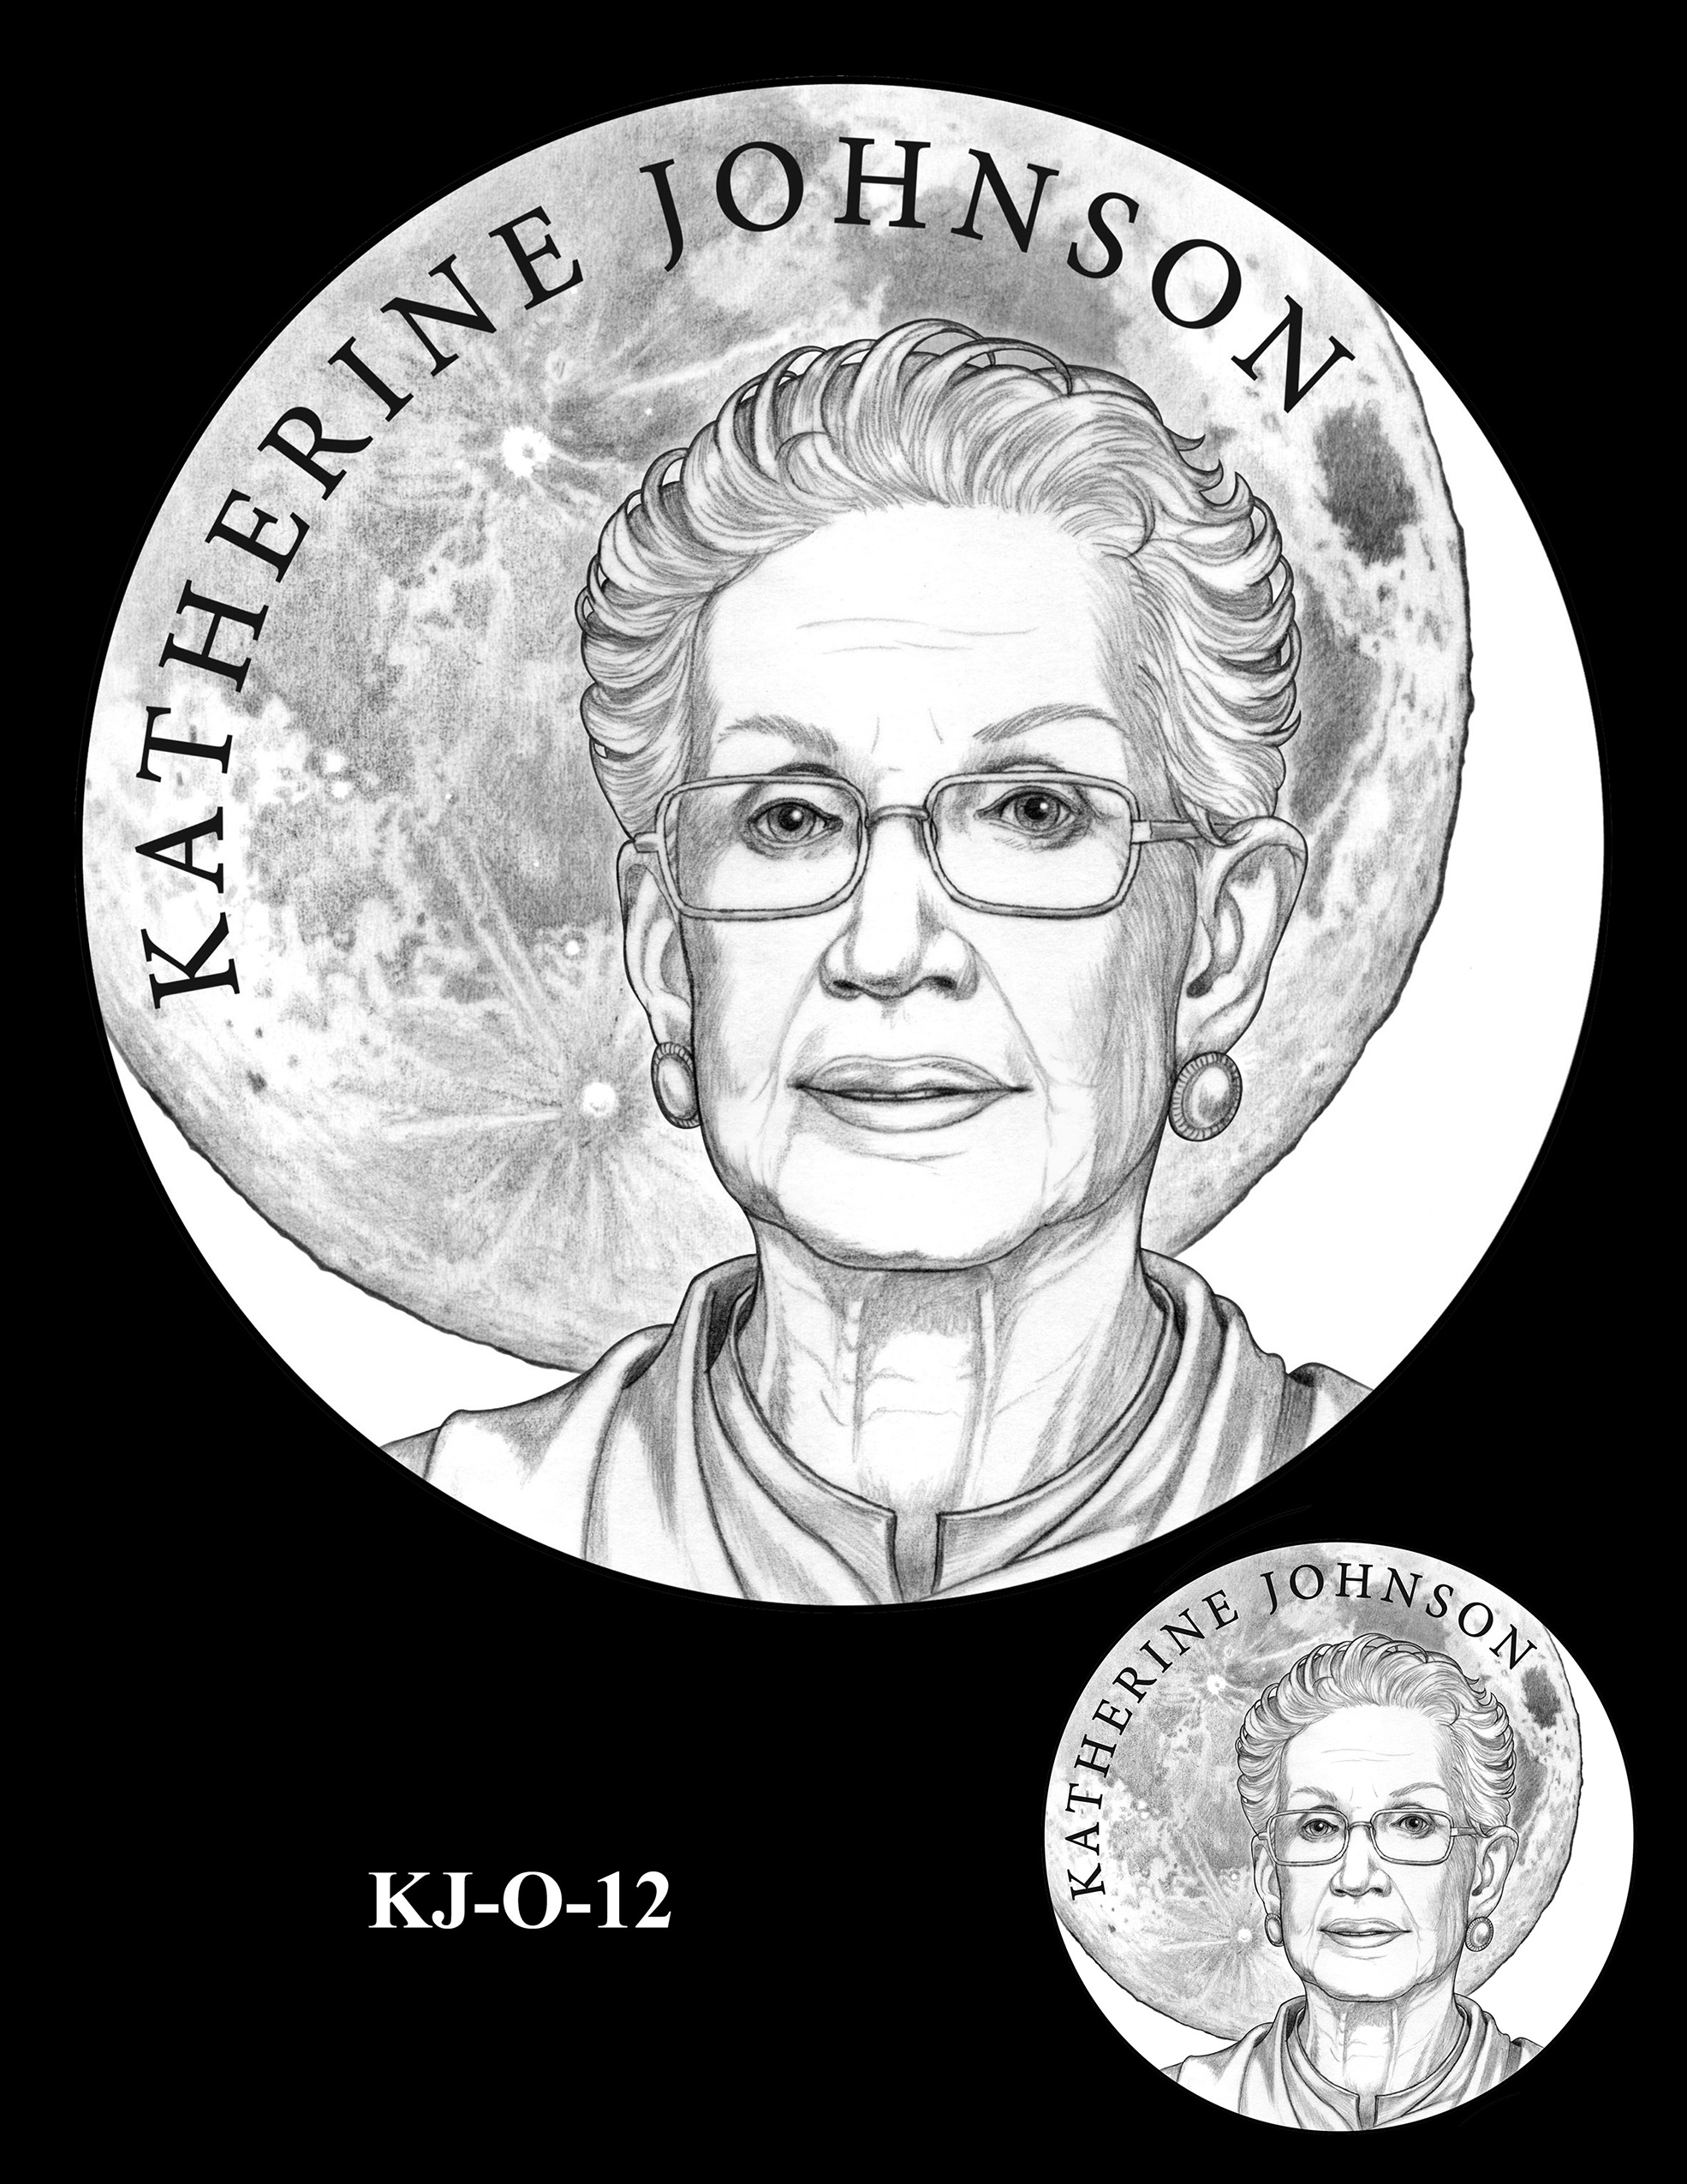 KJ-O-12 -- Katherine Johnson Congressional Gold Medal